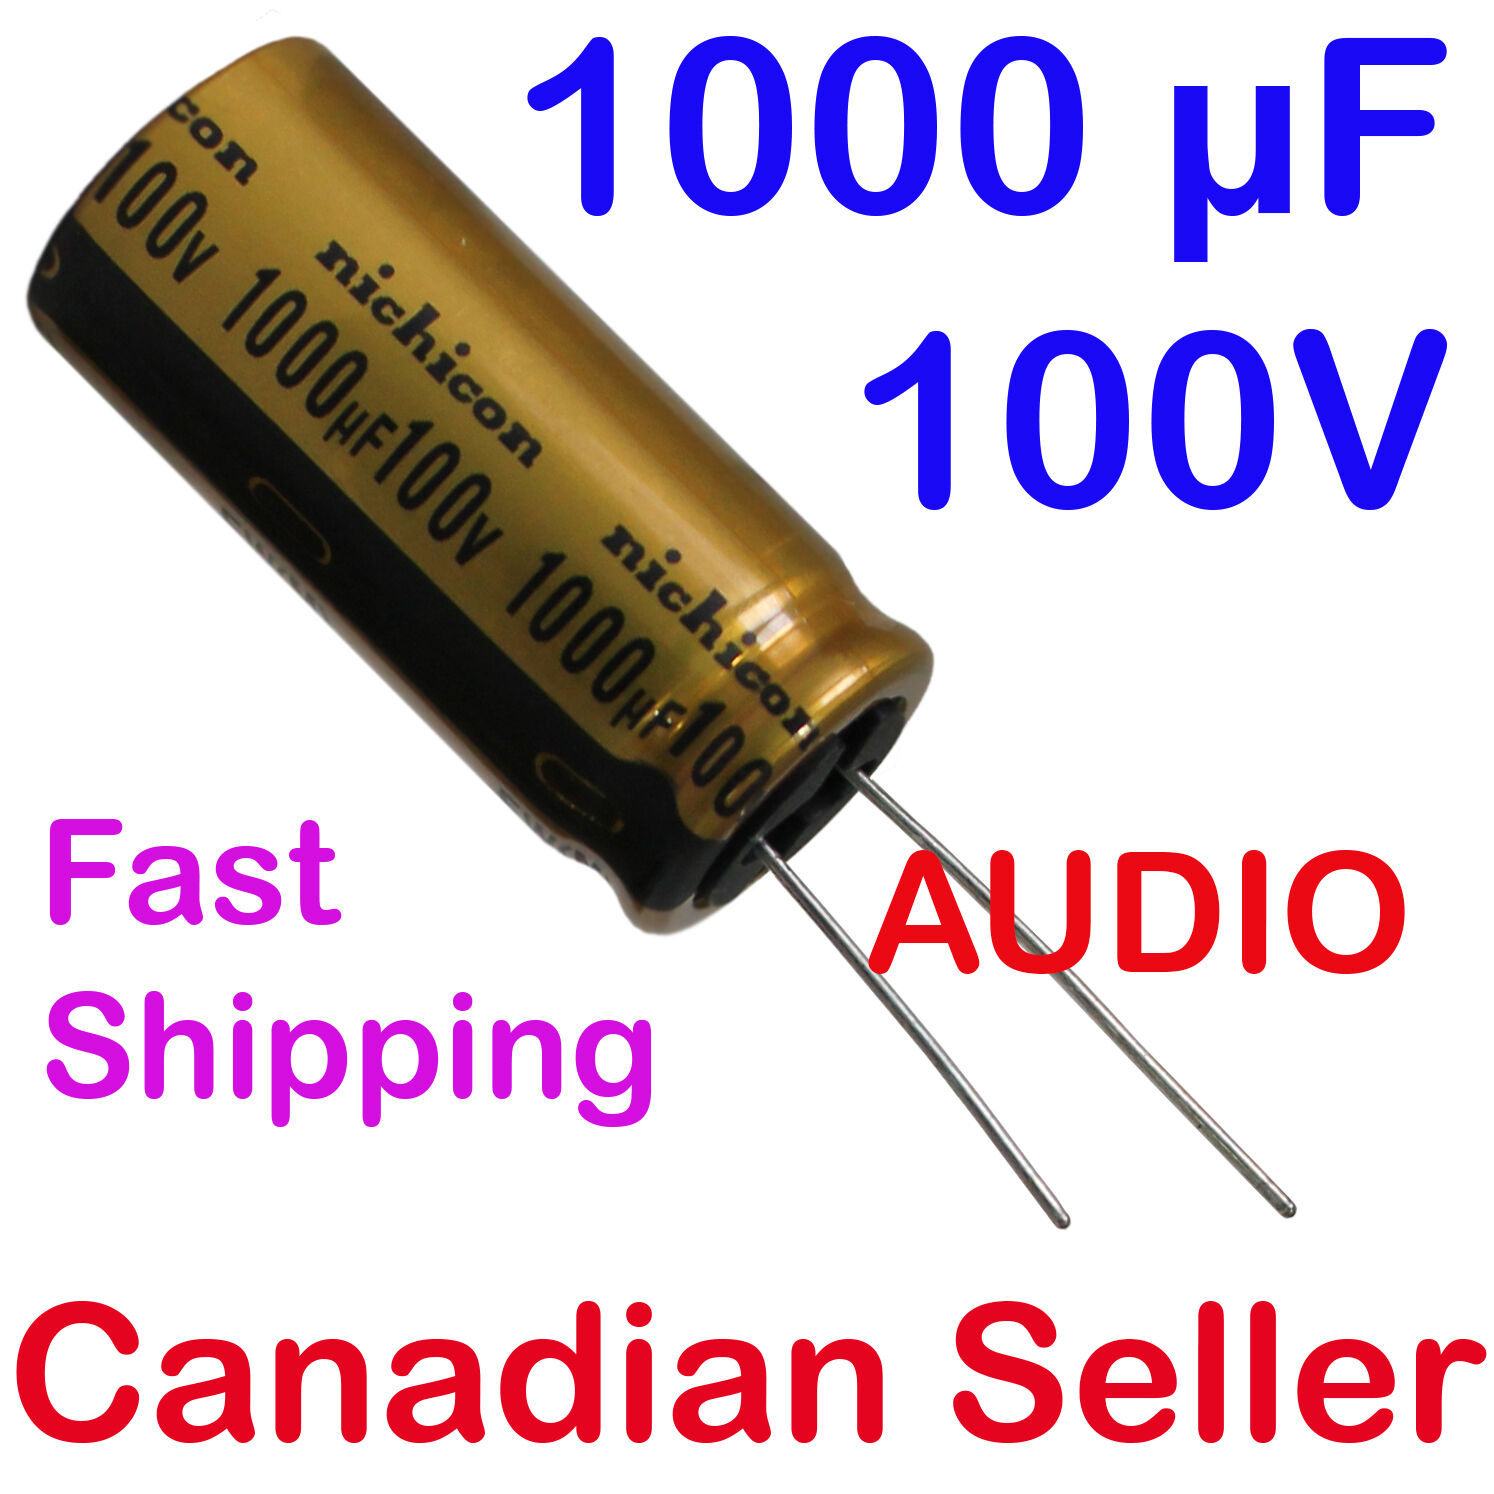 Nichicon Elko audio uka1v472mhd 4700uf 35v 18x35,5mm rm7 4 PCs 5 105 ° 2000h #wp